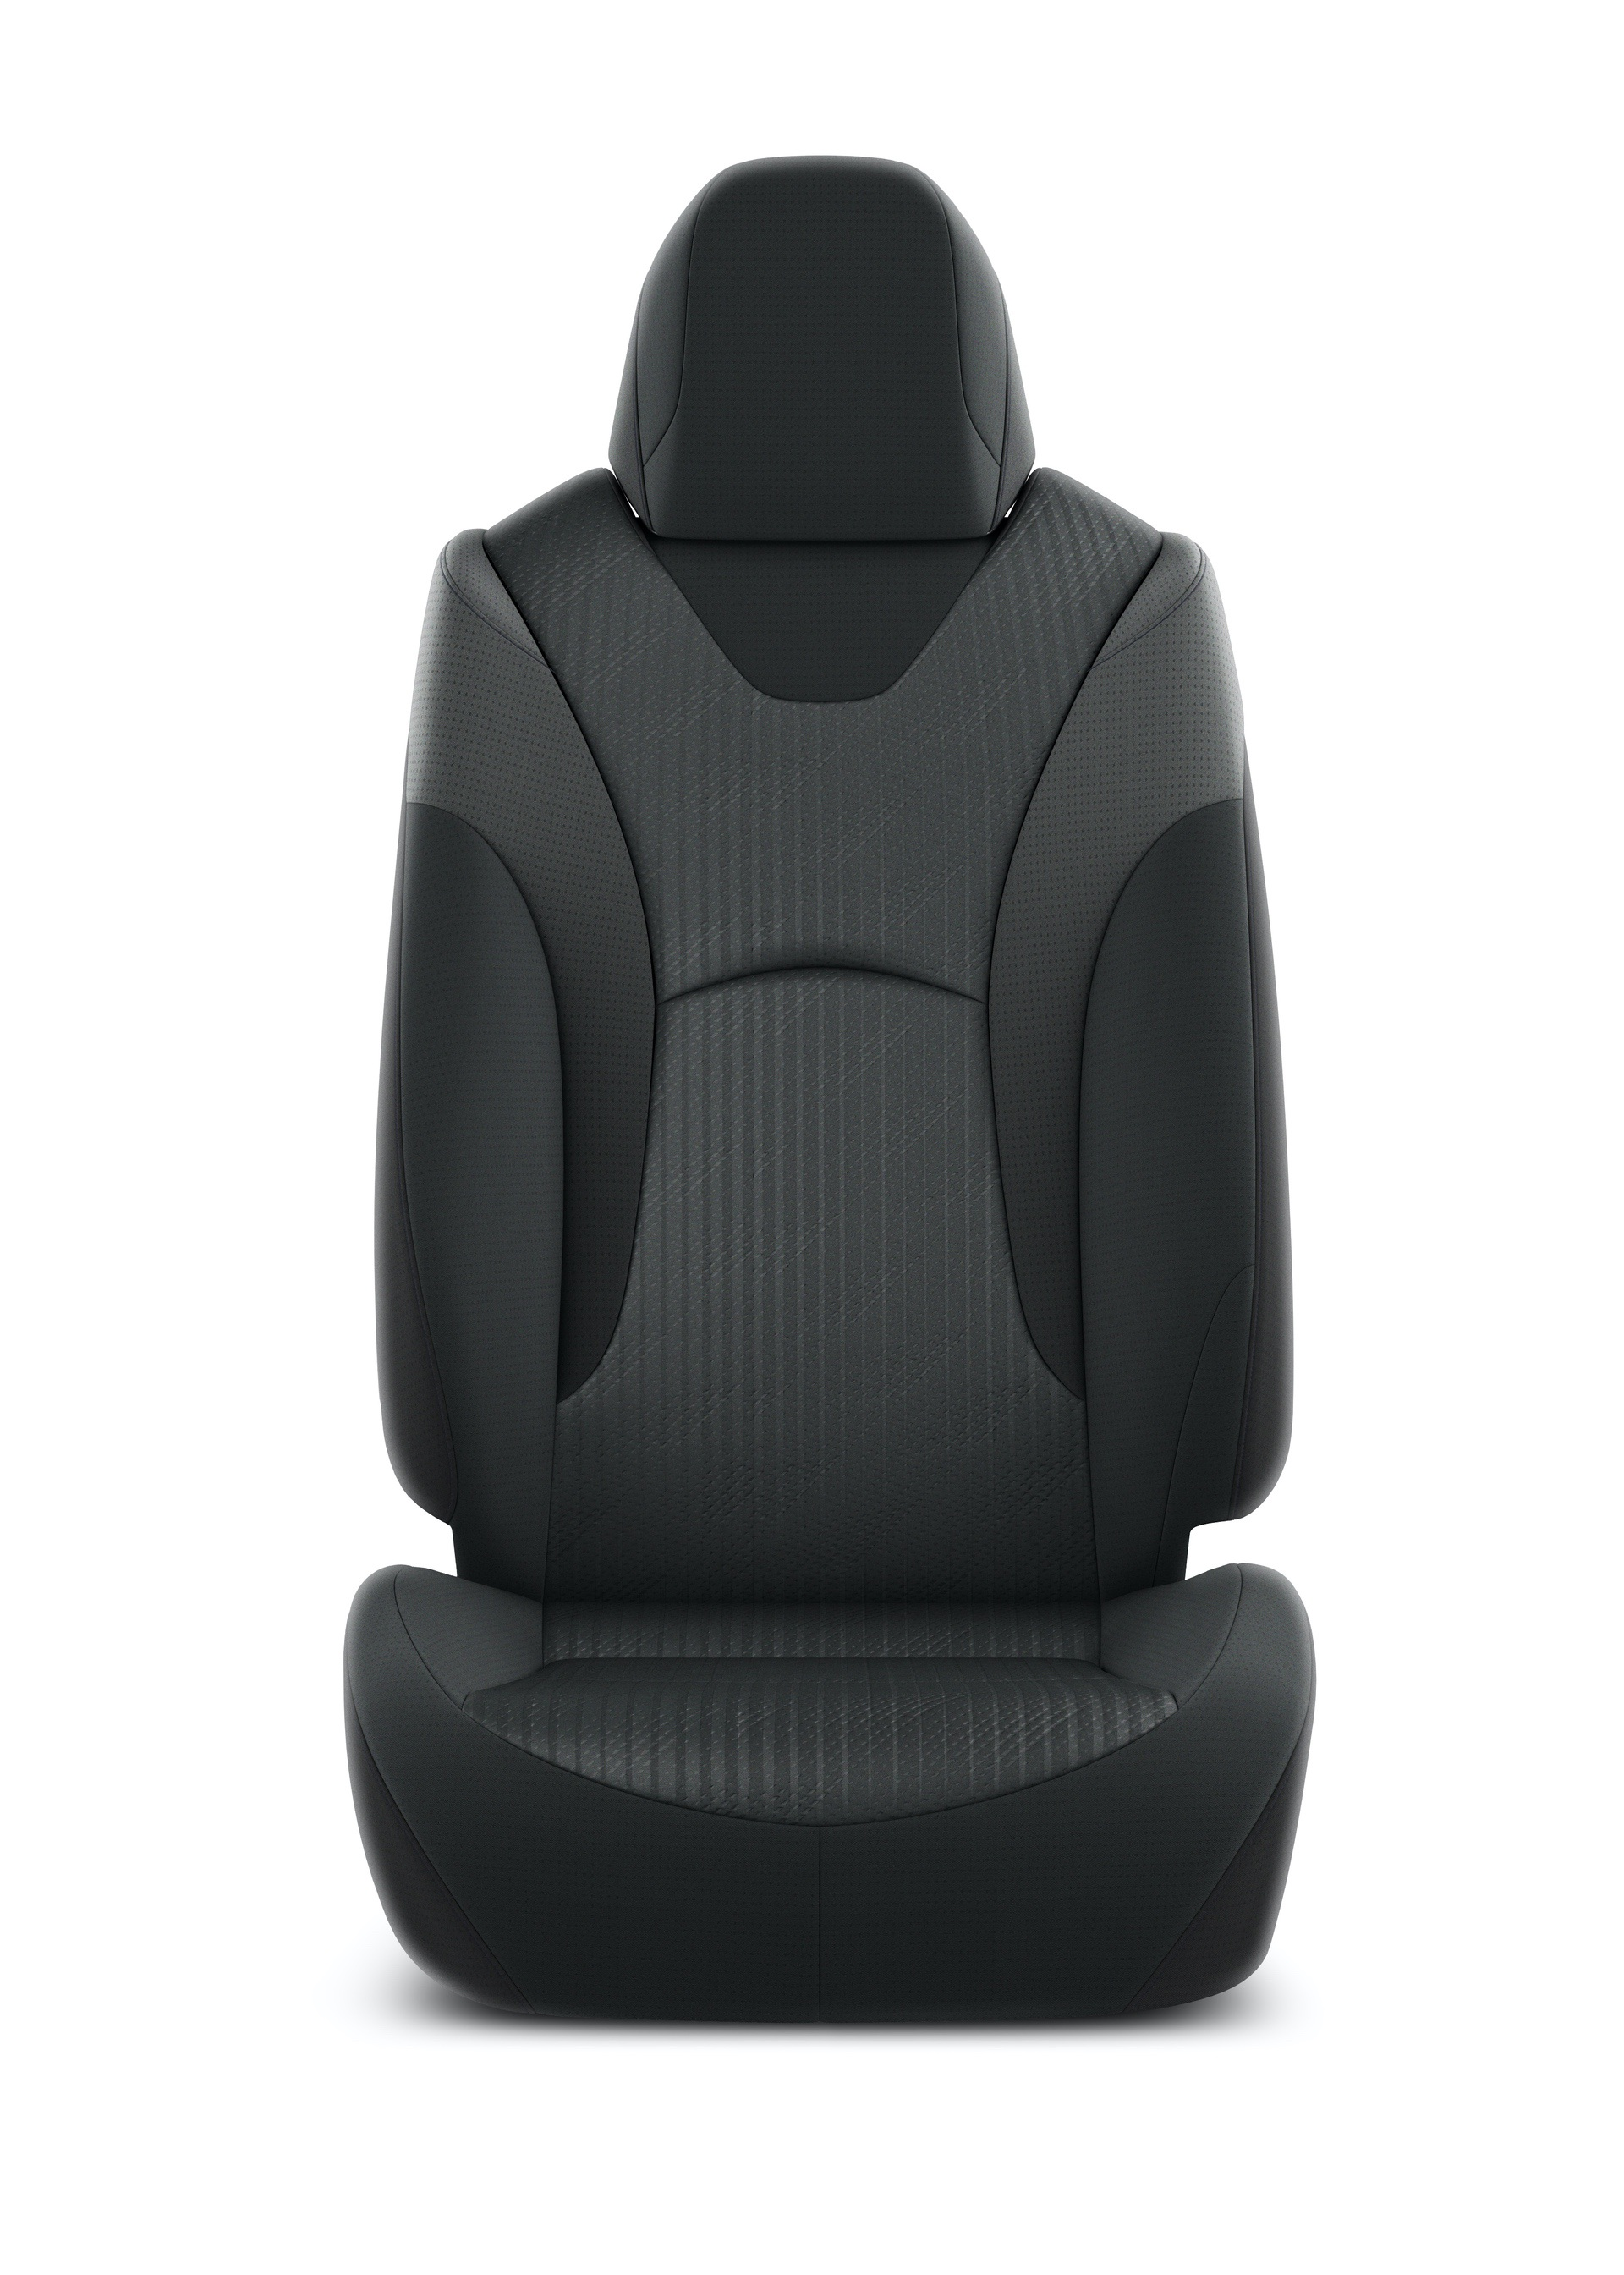 2019_Toyota_Prius_Plug-in_Hybrid_0009